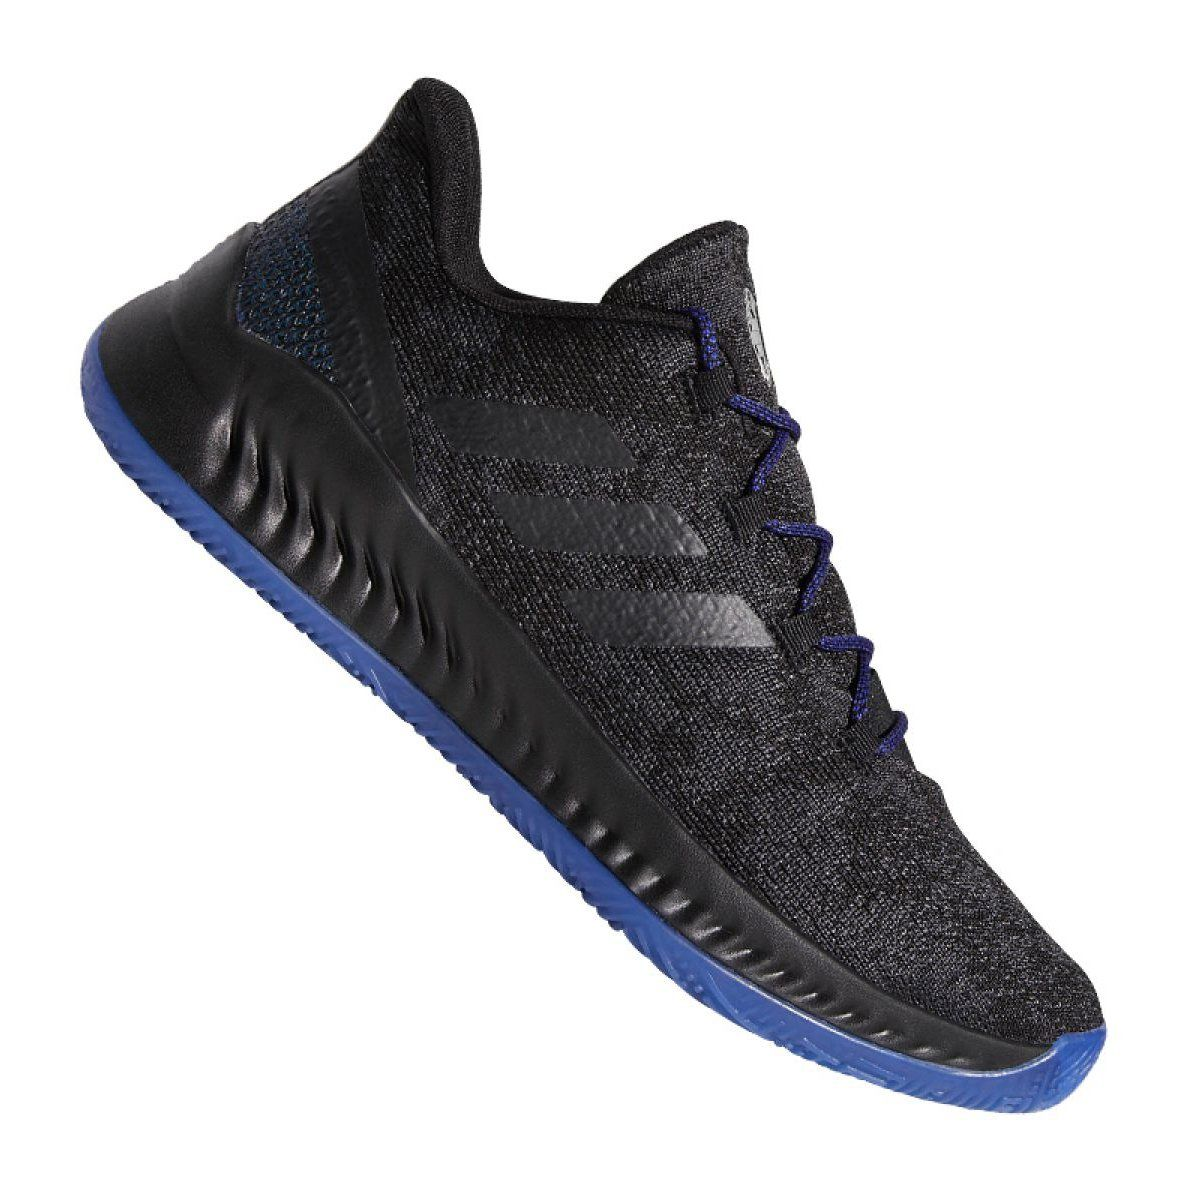 Adidas Harden B Exm F97250 Shoes Black Black Sports Shoes Basketball Black Shoes Basketball Shoes